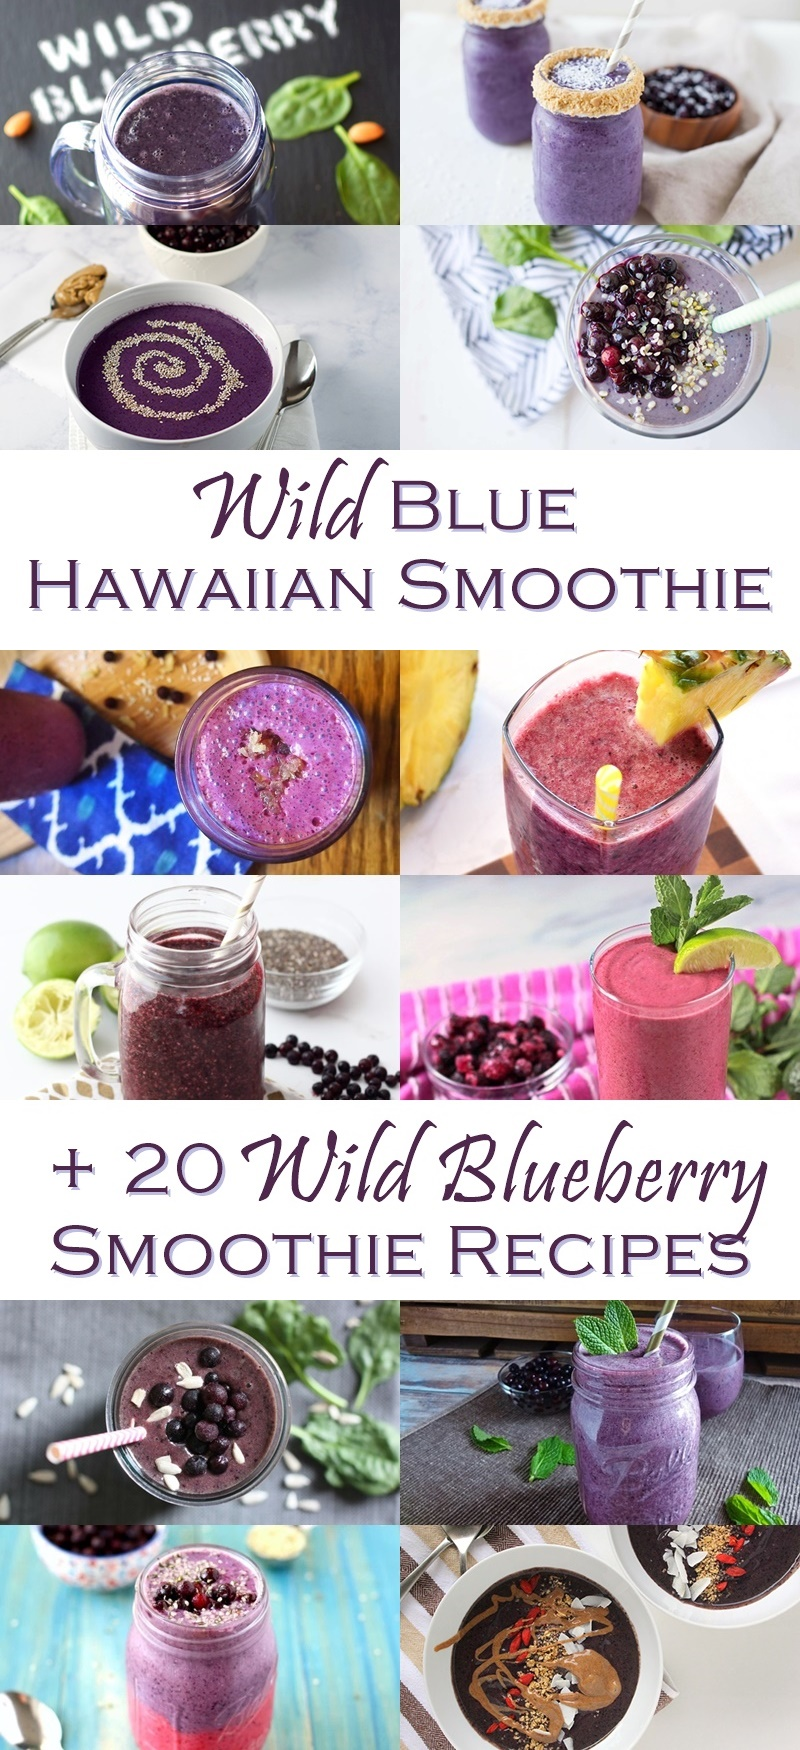 21 Dairy-Free Wild Blueberry Smoothie Recipes